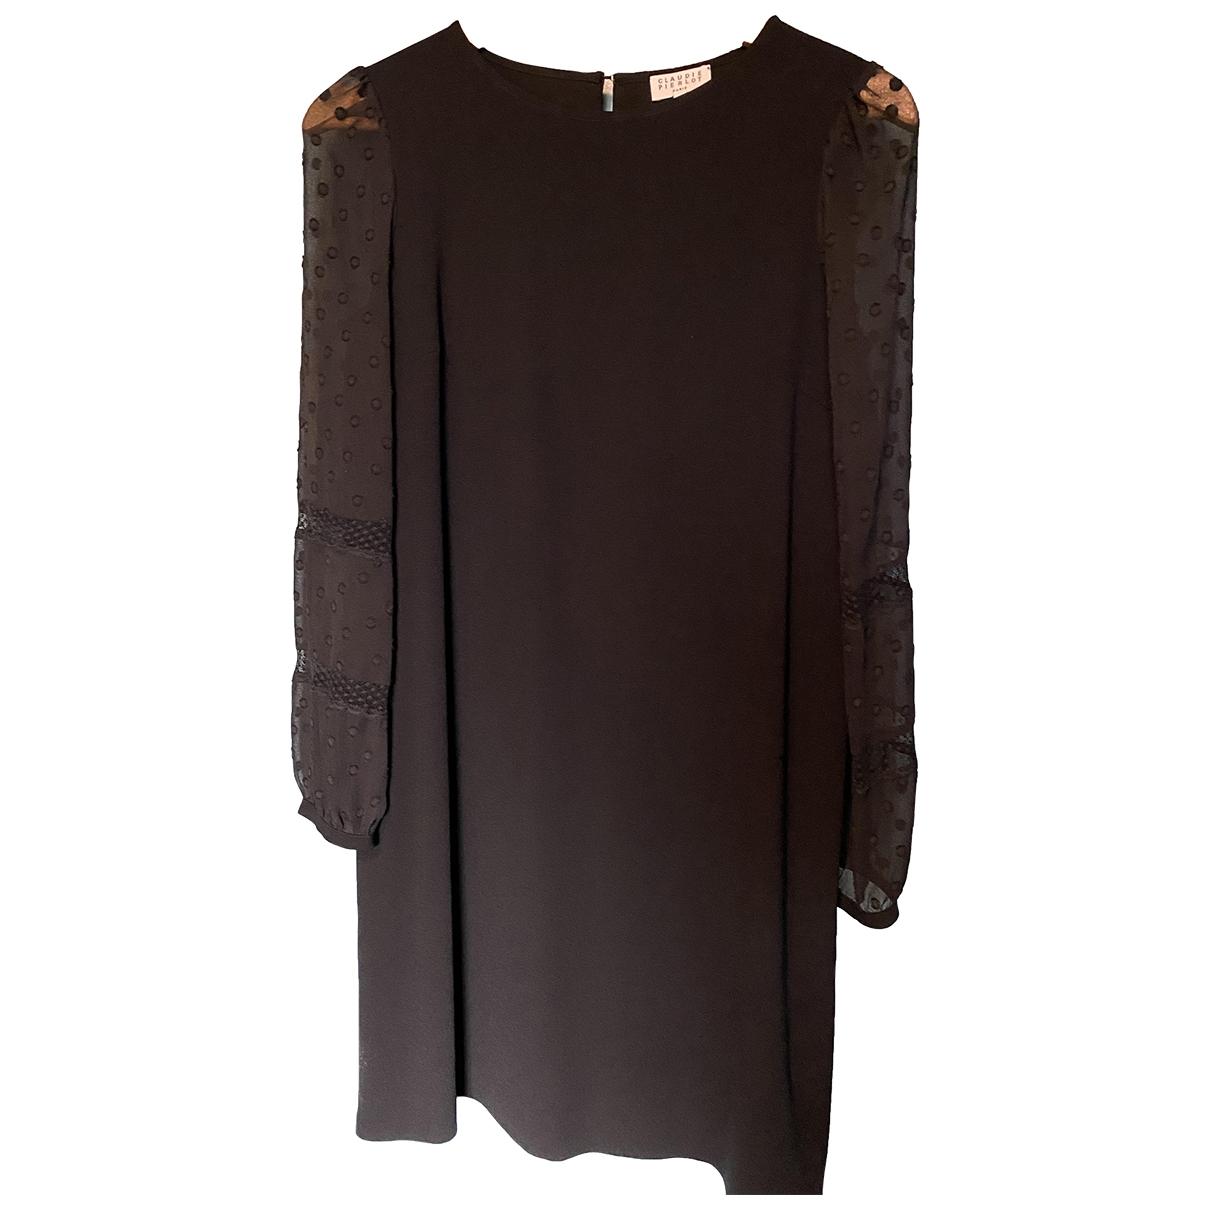 Claudie Pierlot Spring Summer 2019 Black dress for Women 38 FR